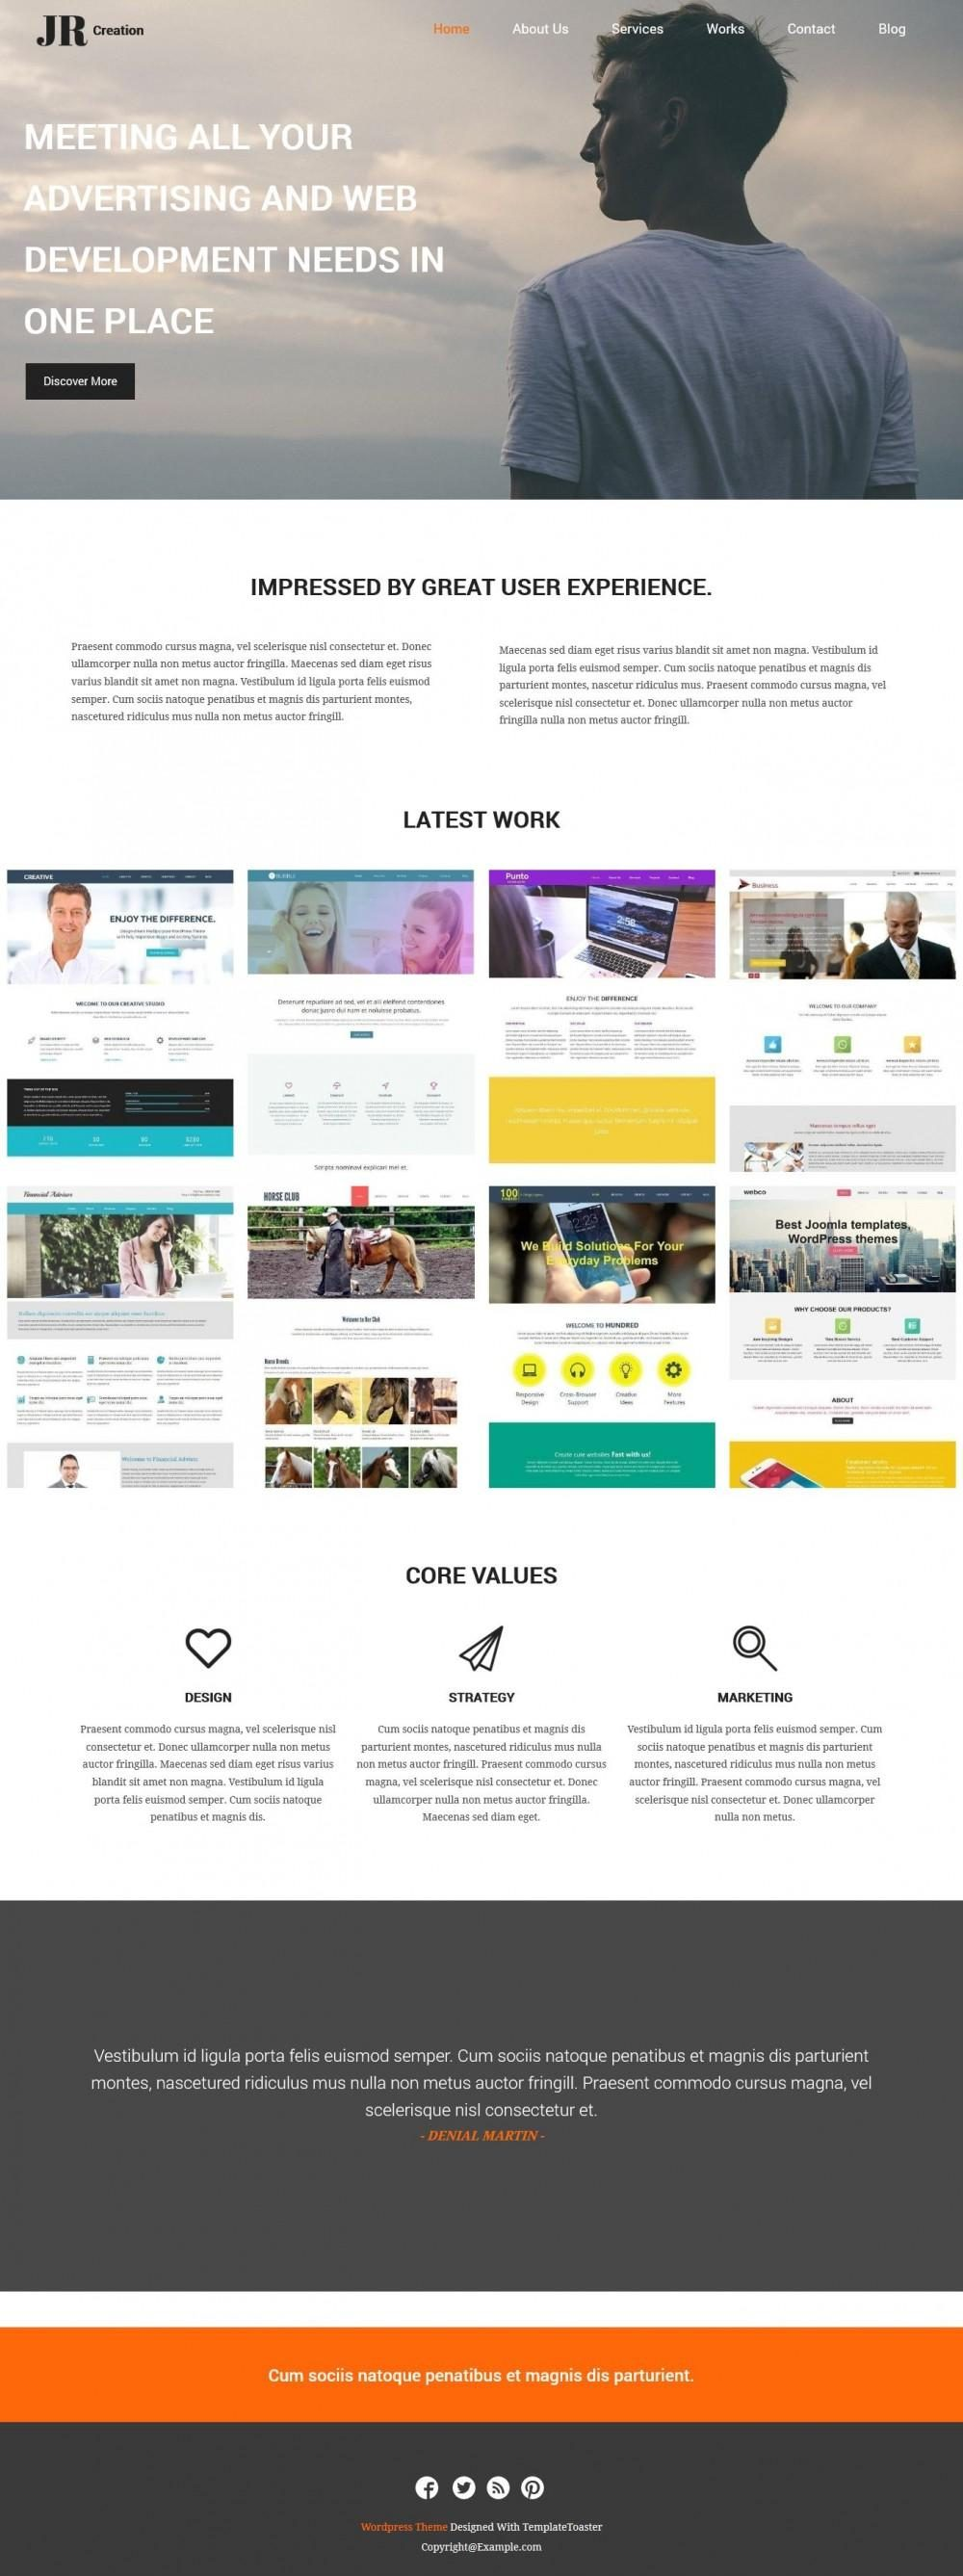 JR Creation - WordPress Theme for Web Designer Portfolio